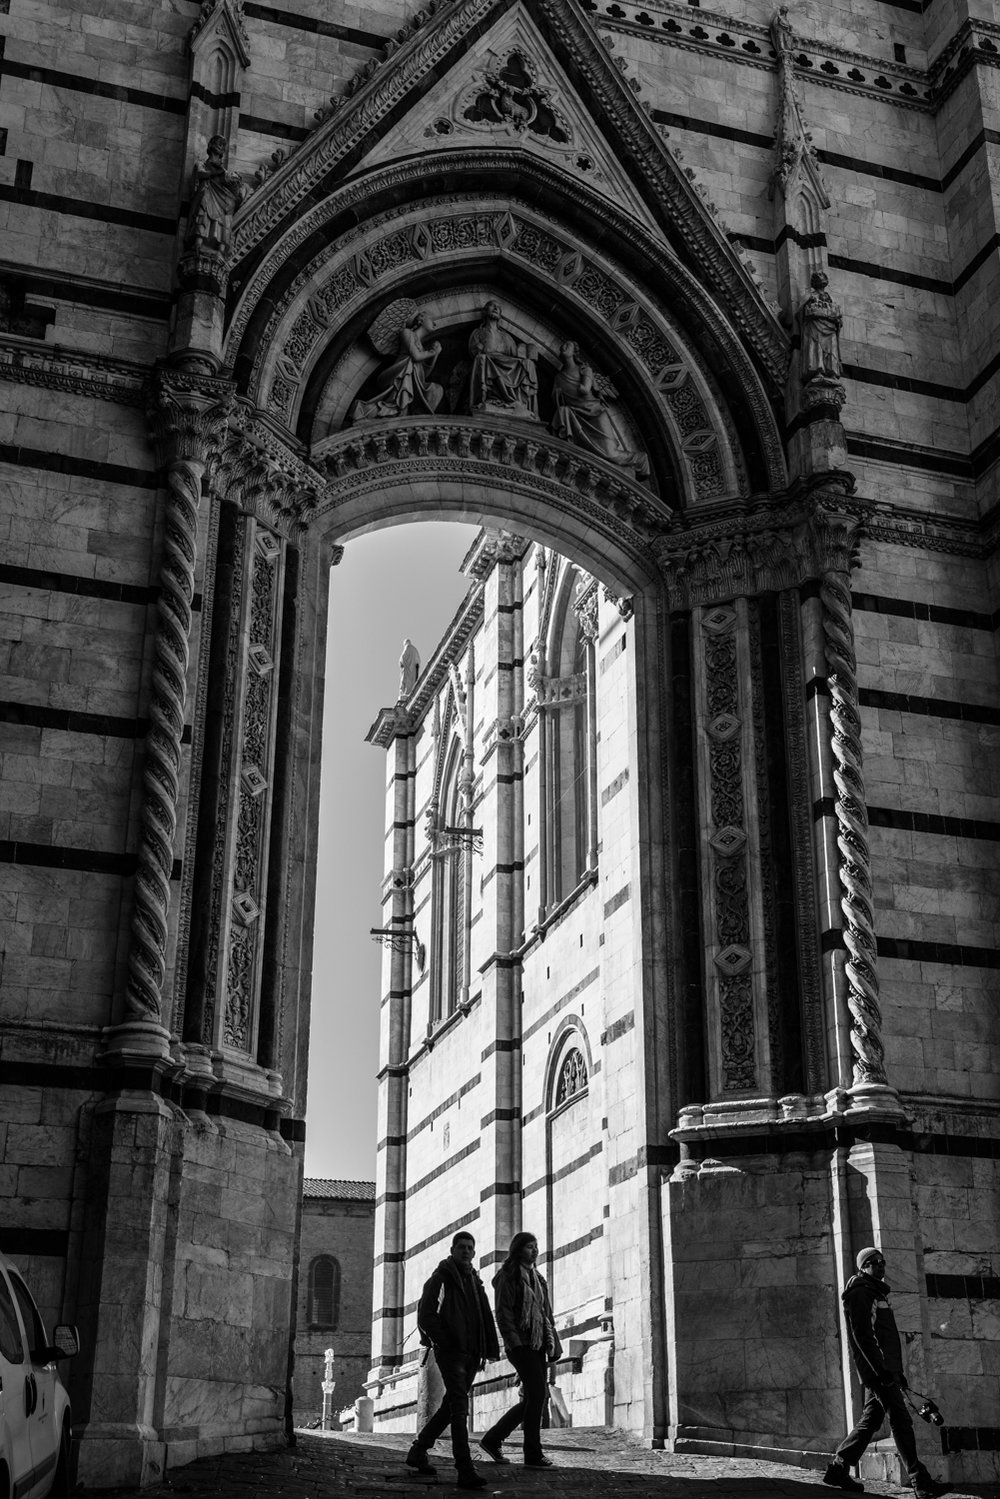 Siena Arch